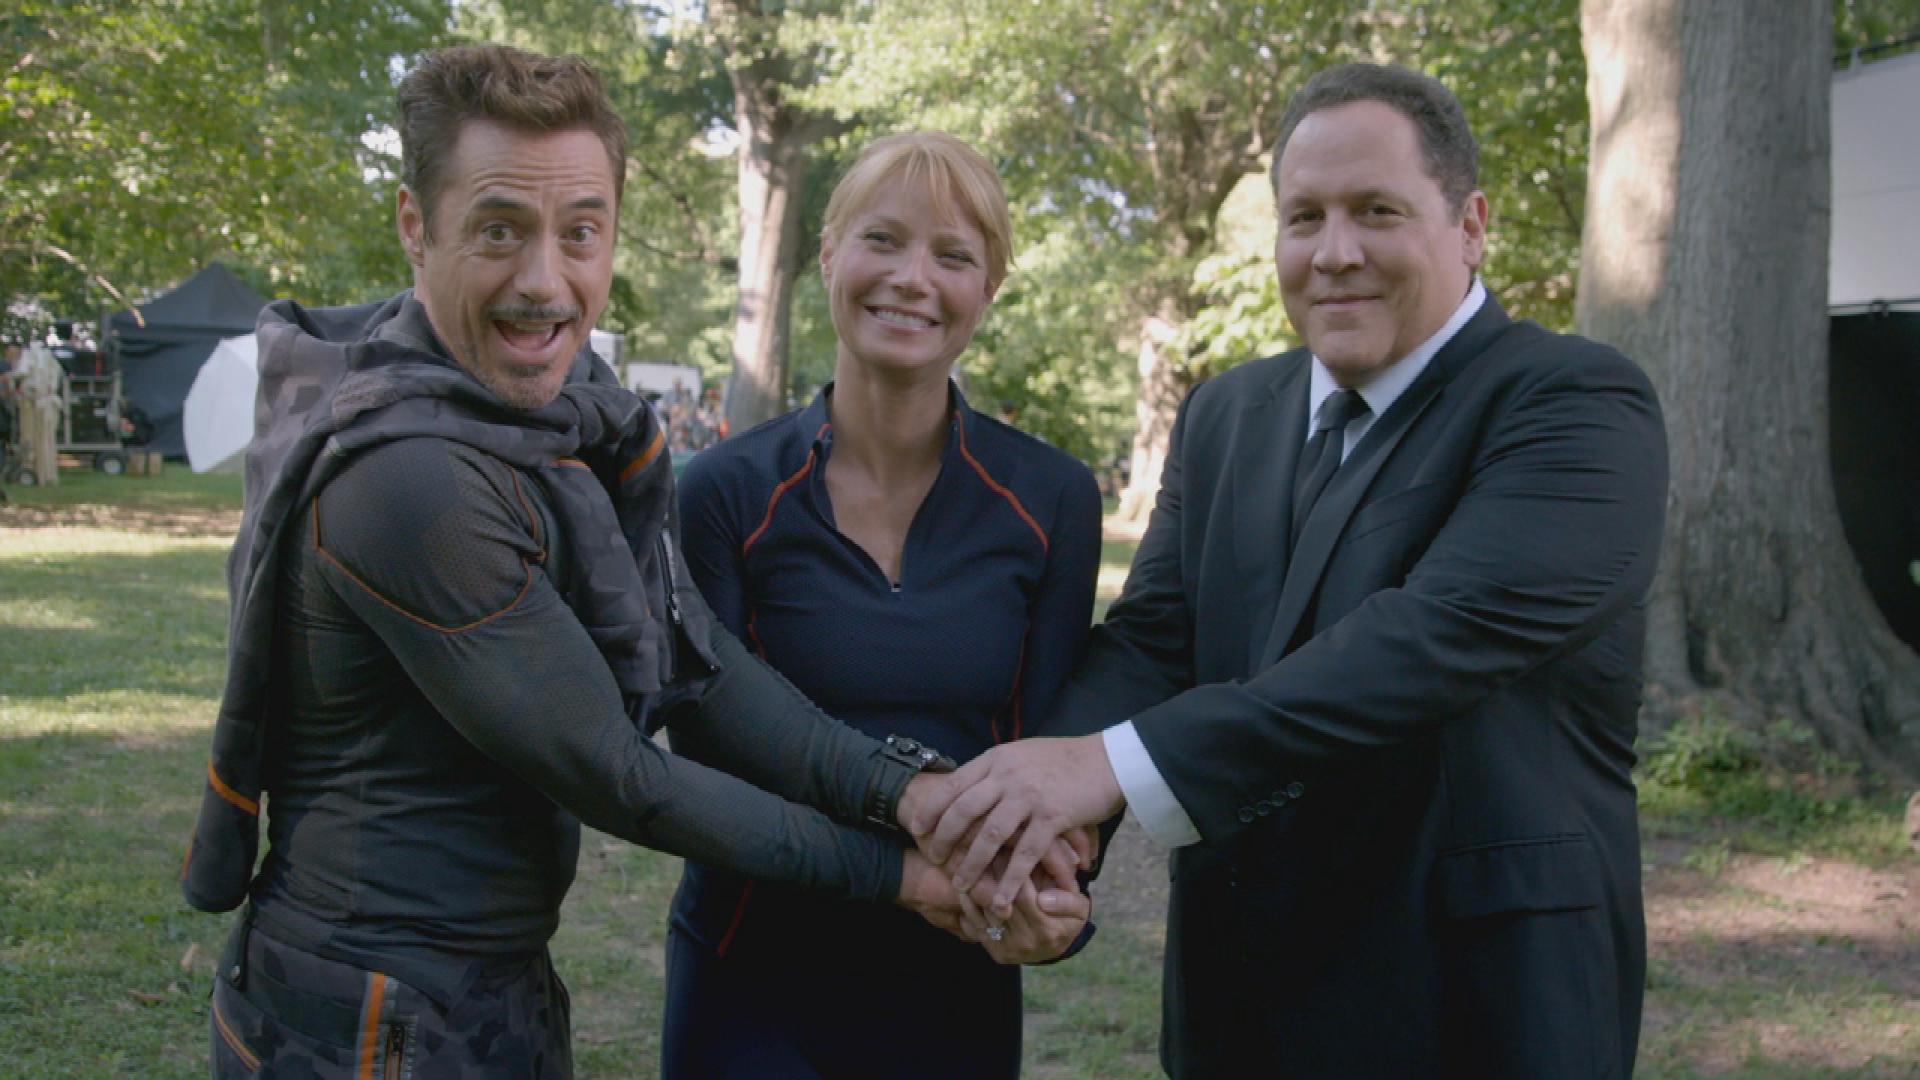 'Avengers' Gag Reel: Chris Evans, Robert Downey Jr. Through the Years! (Exclusive)